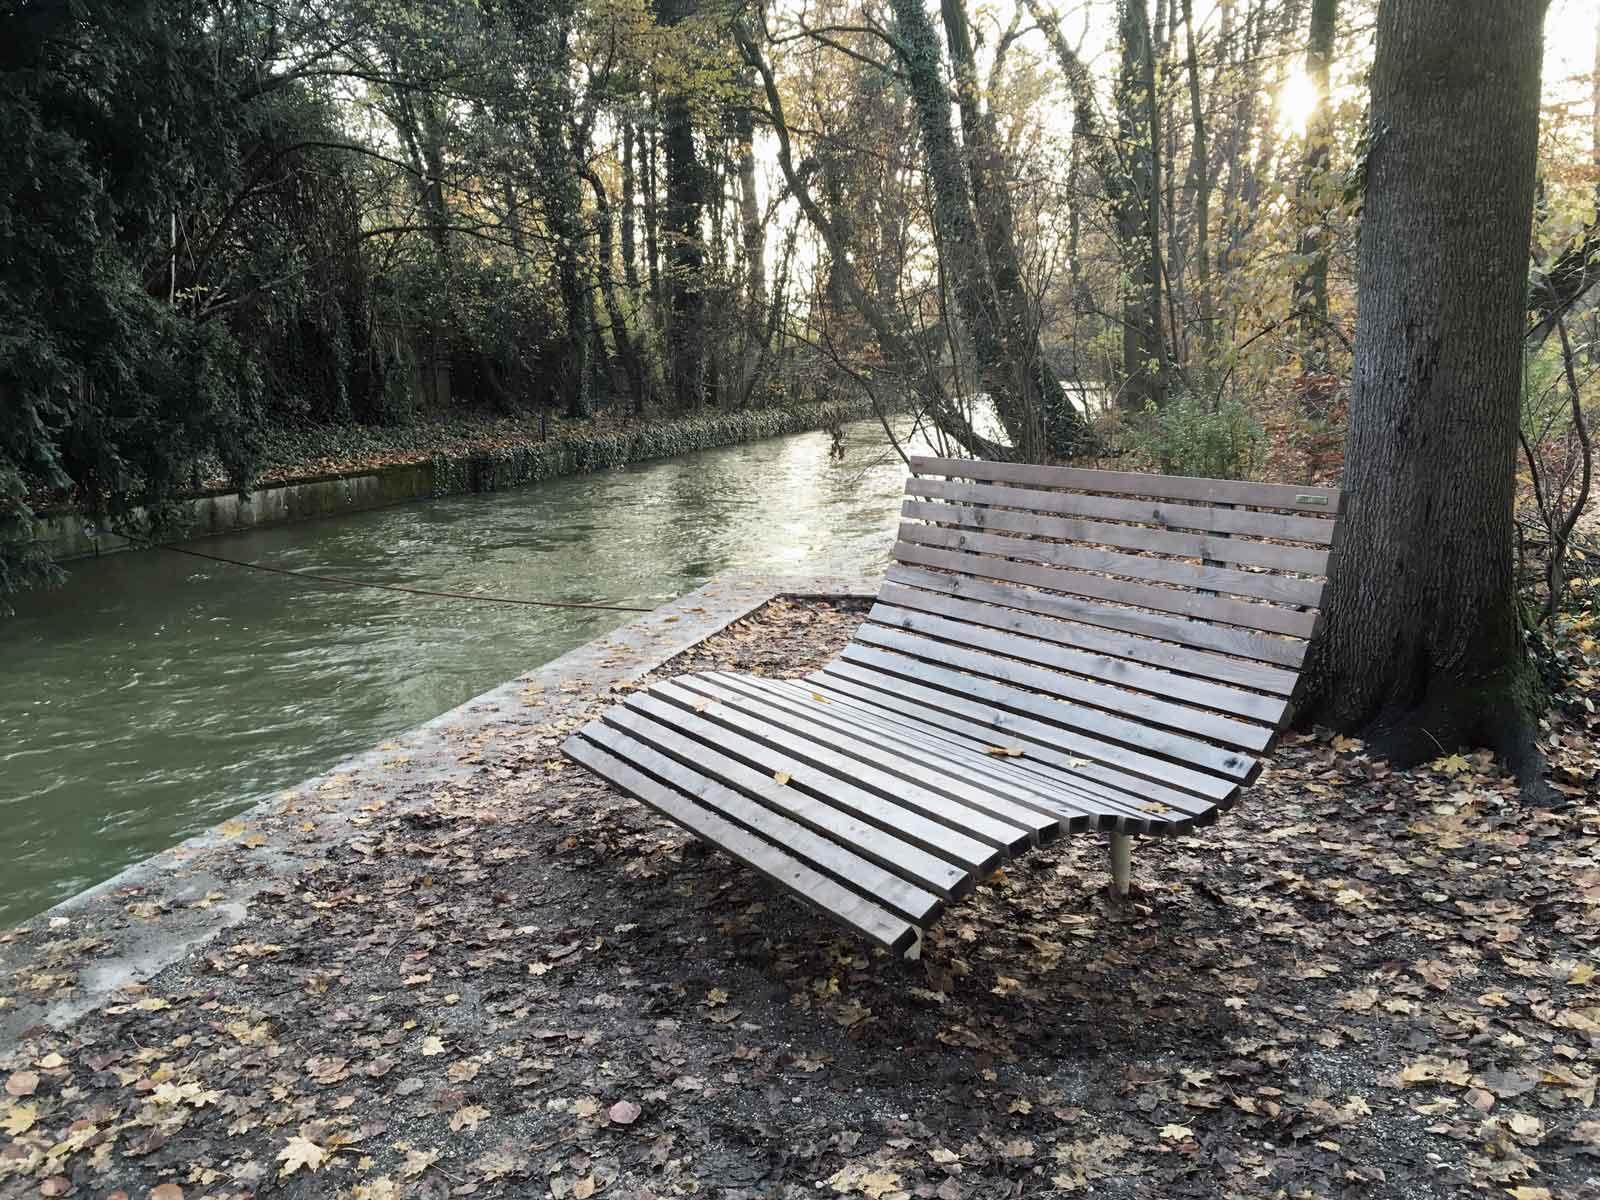 Holzliege-Wellenform